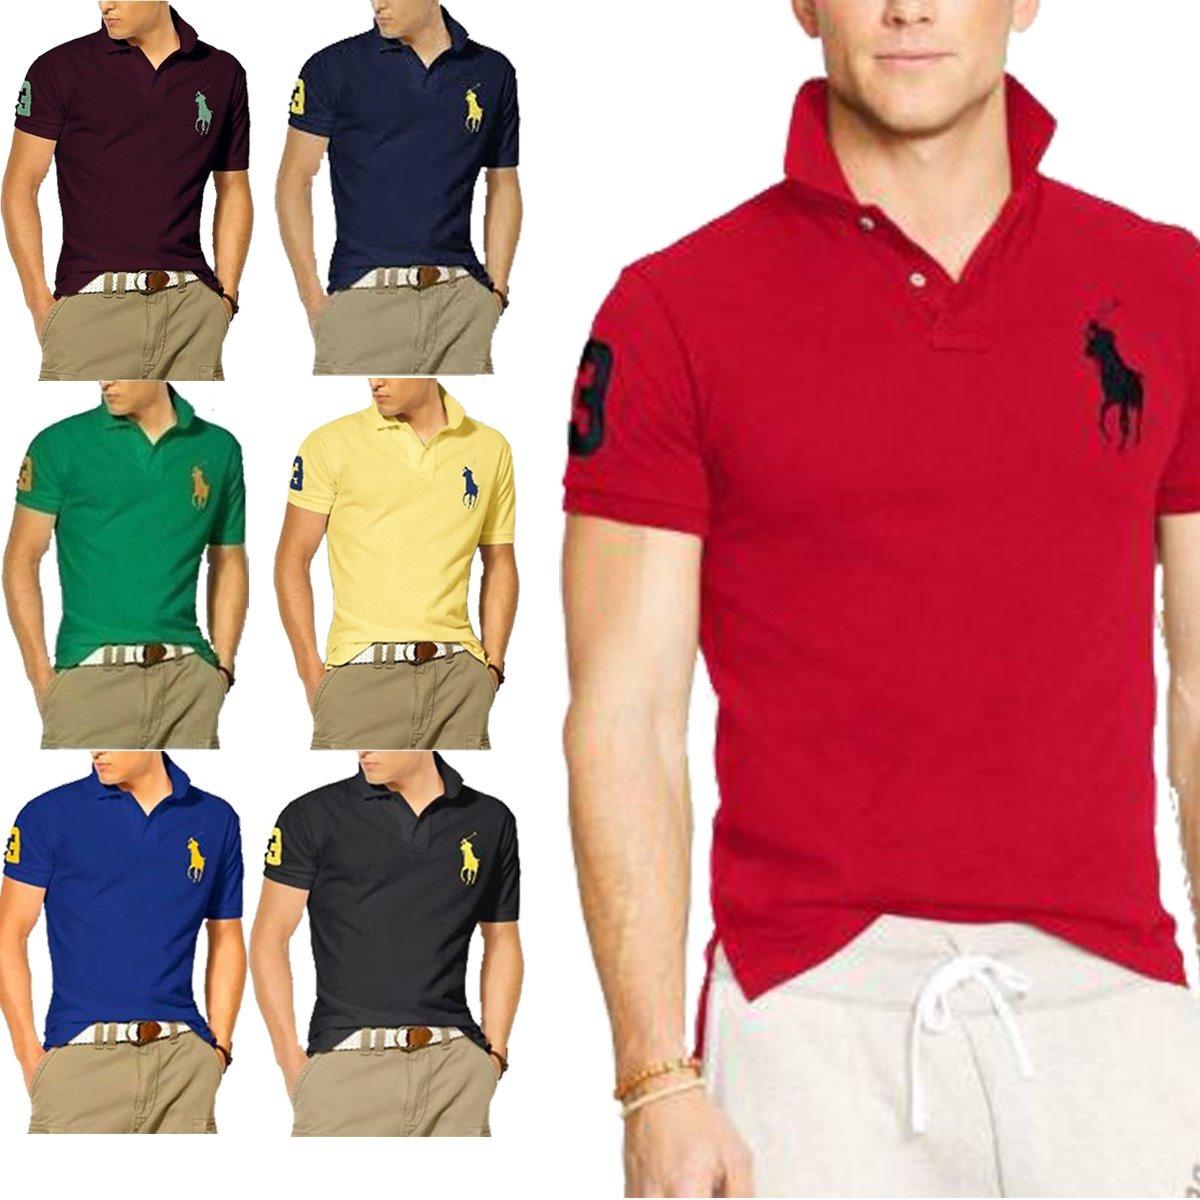 1ae453c7c3 Kit C 10 Camisas Camisetas Atacado Gola Polo Masculina Marca - R ...